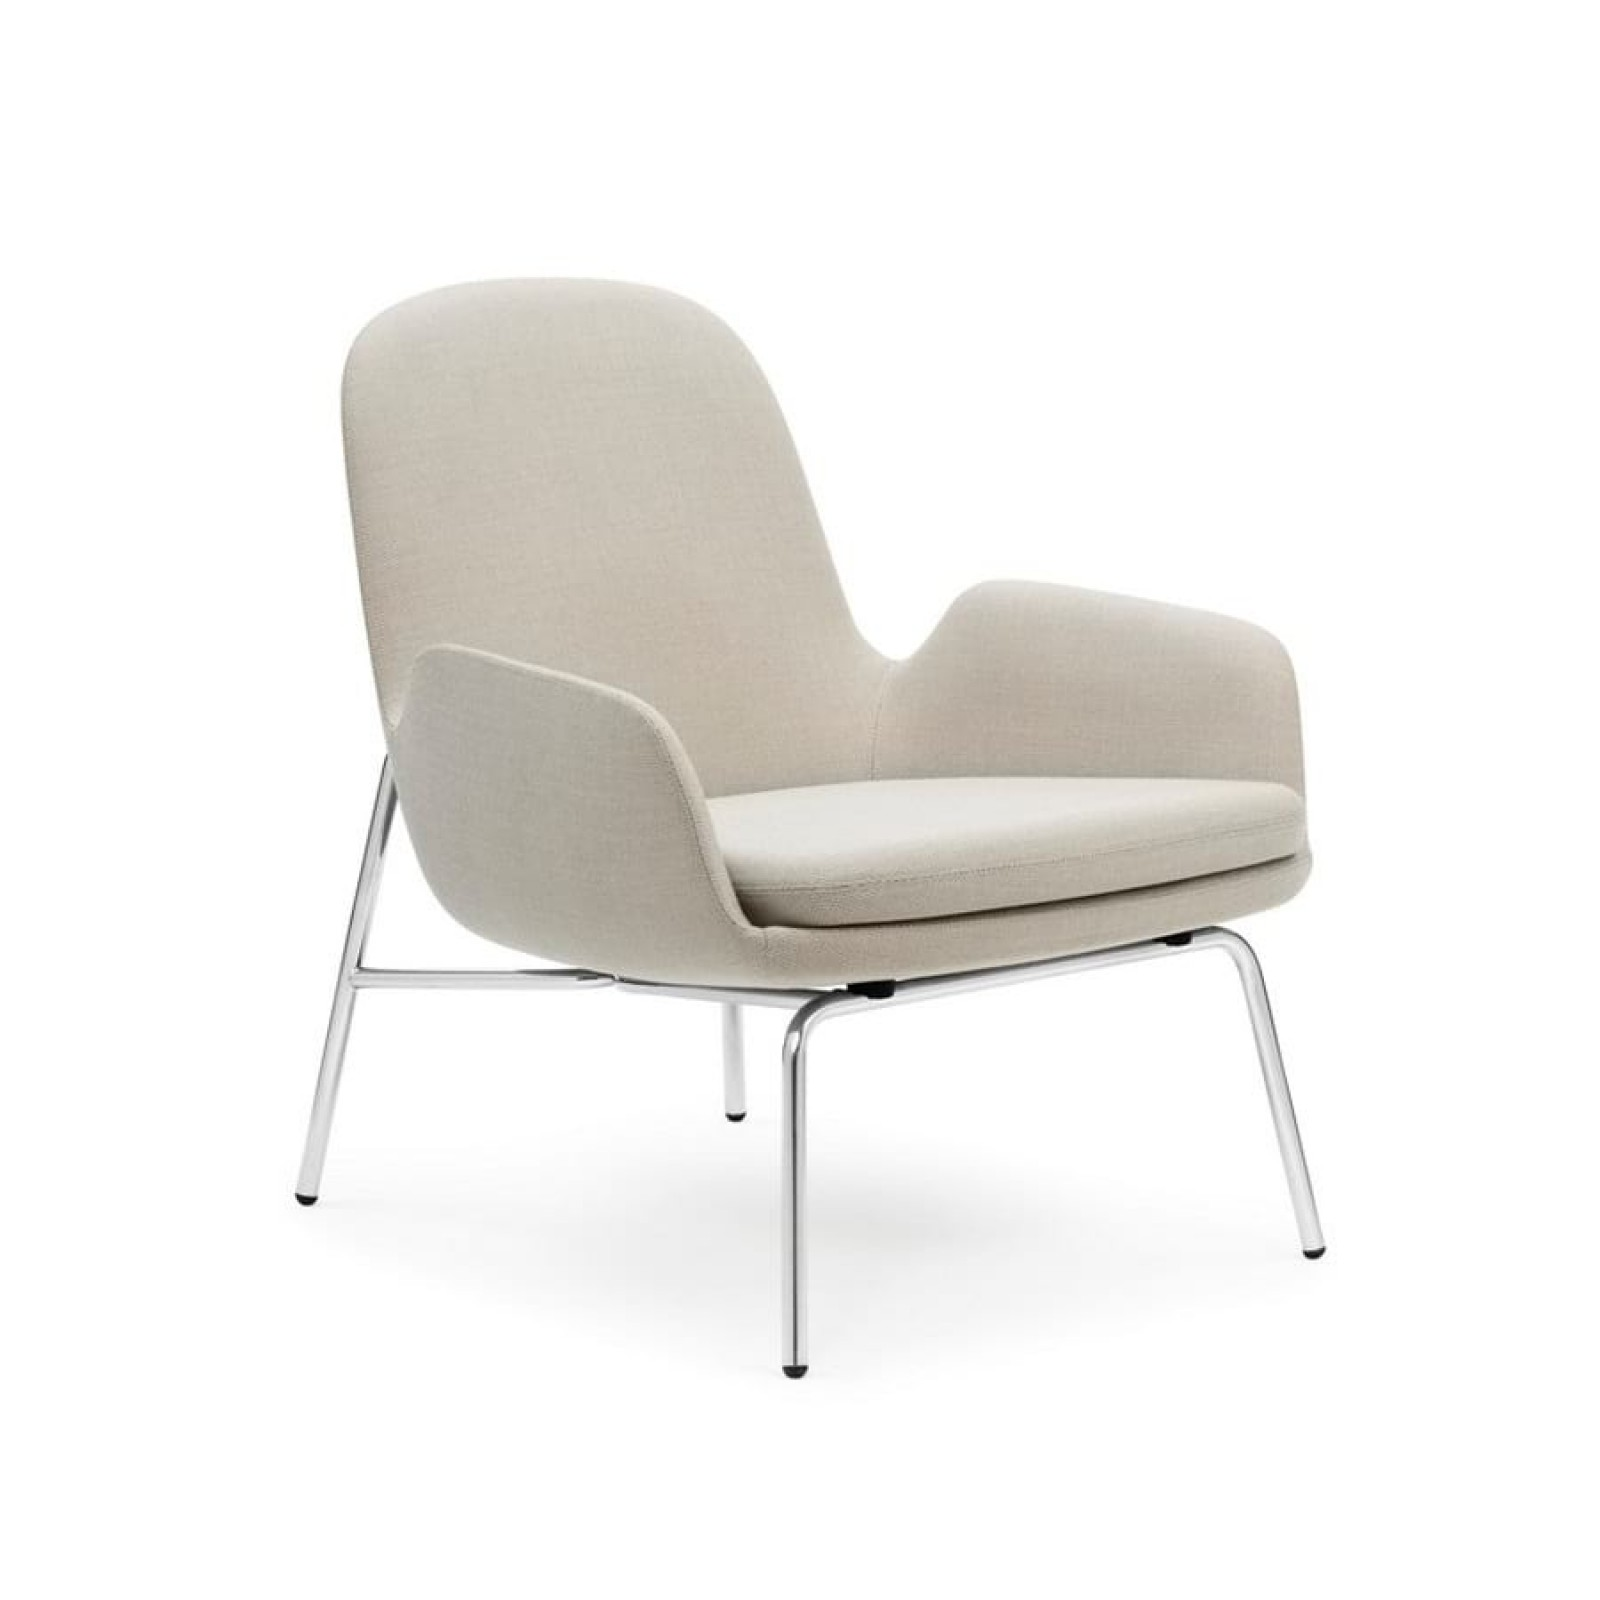 Era Lounge Chair Low (Metal) - Normann Copenhagen